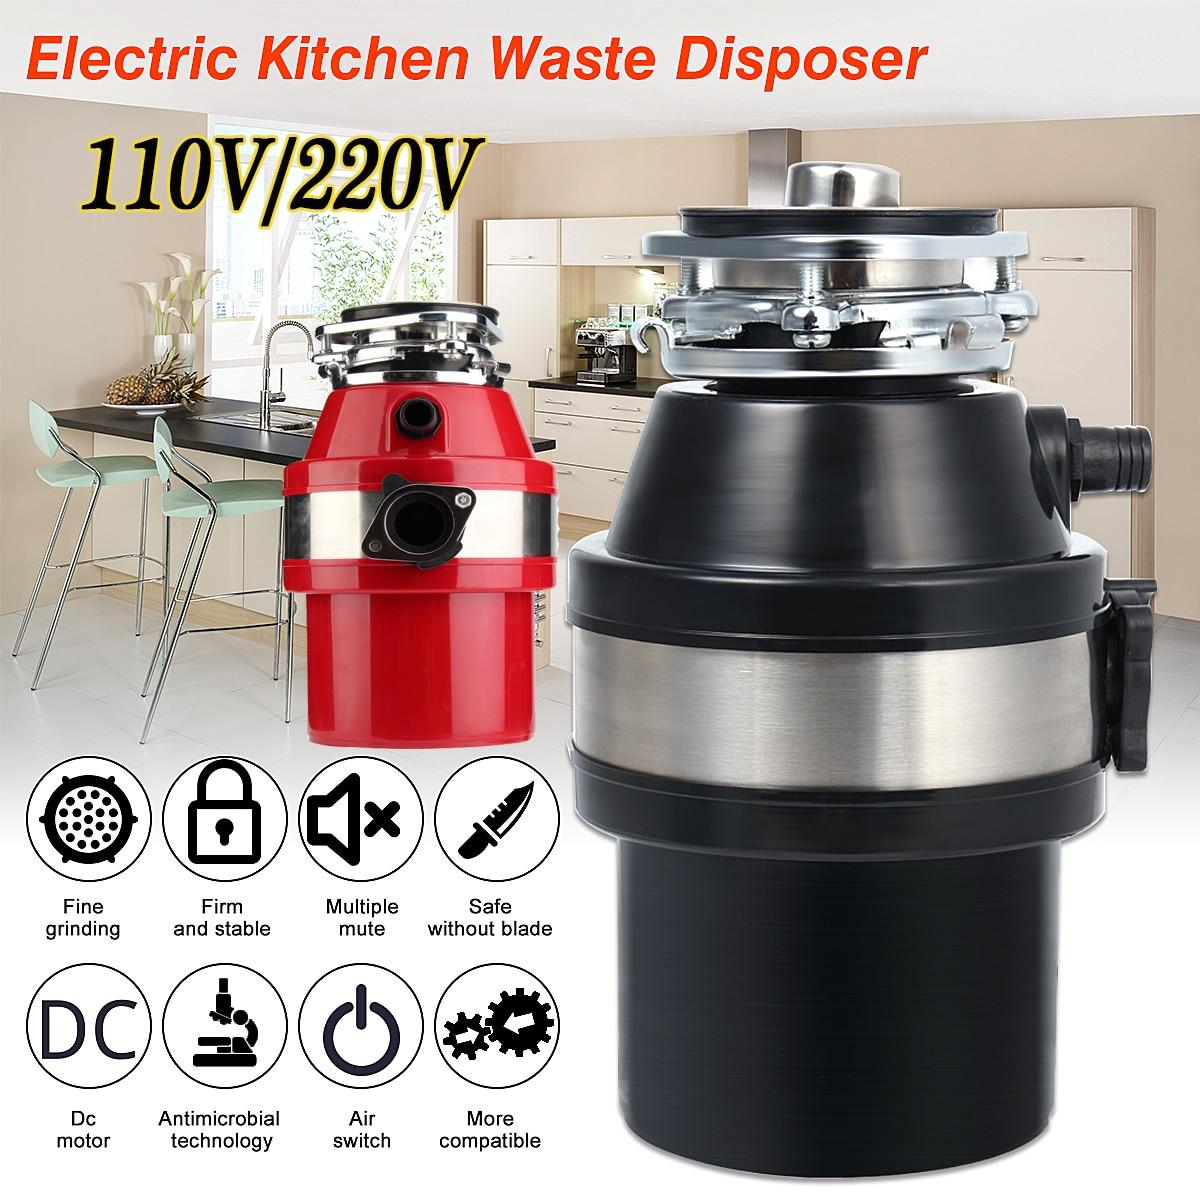 370W 220V Waste Disposer Food Garbage Sink Disposal Garbage Disposal with Power Cord US Plug garbage berlin